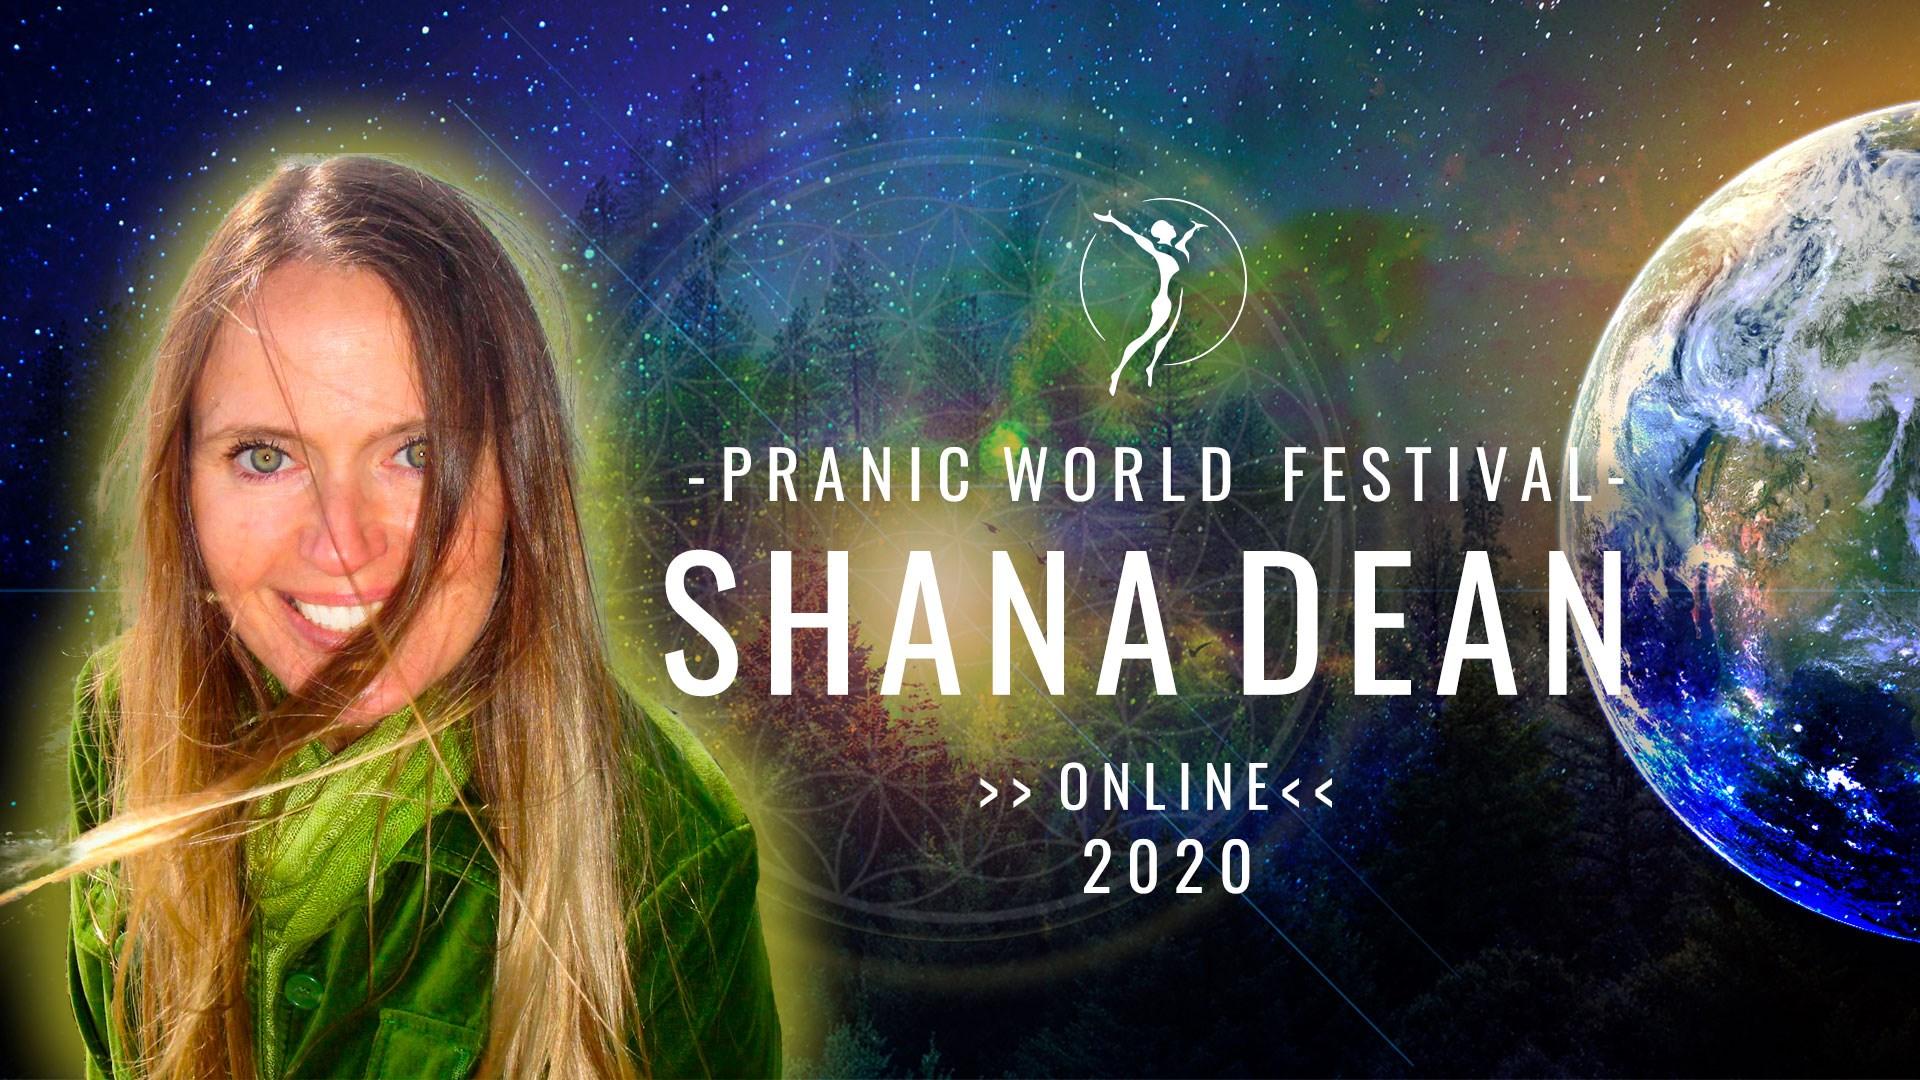 Shana Dean